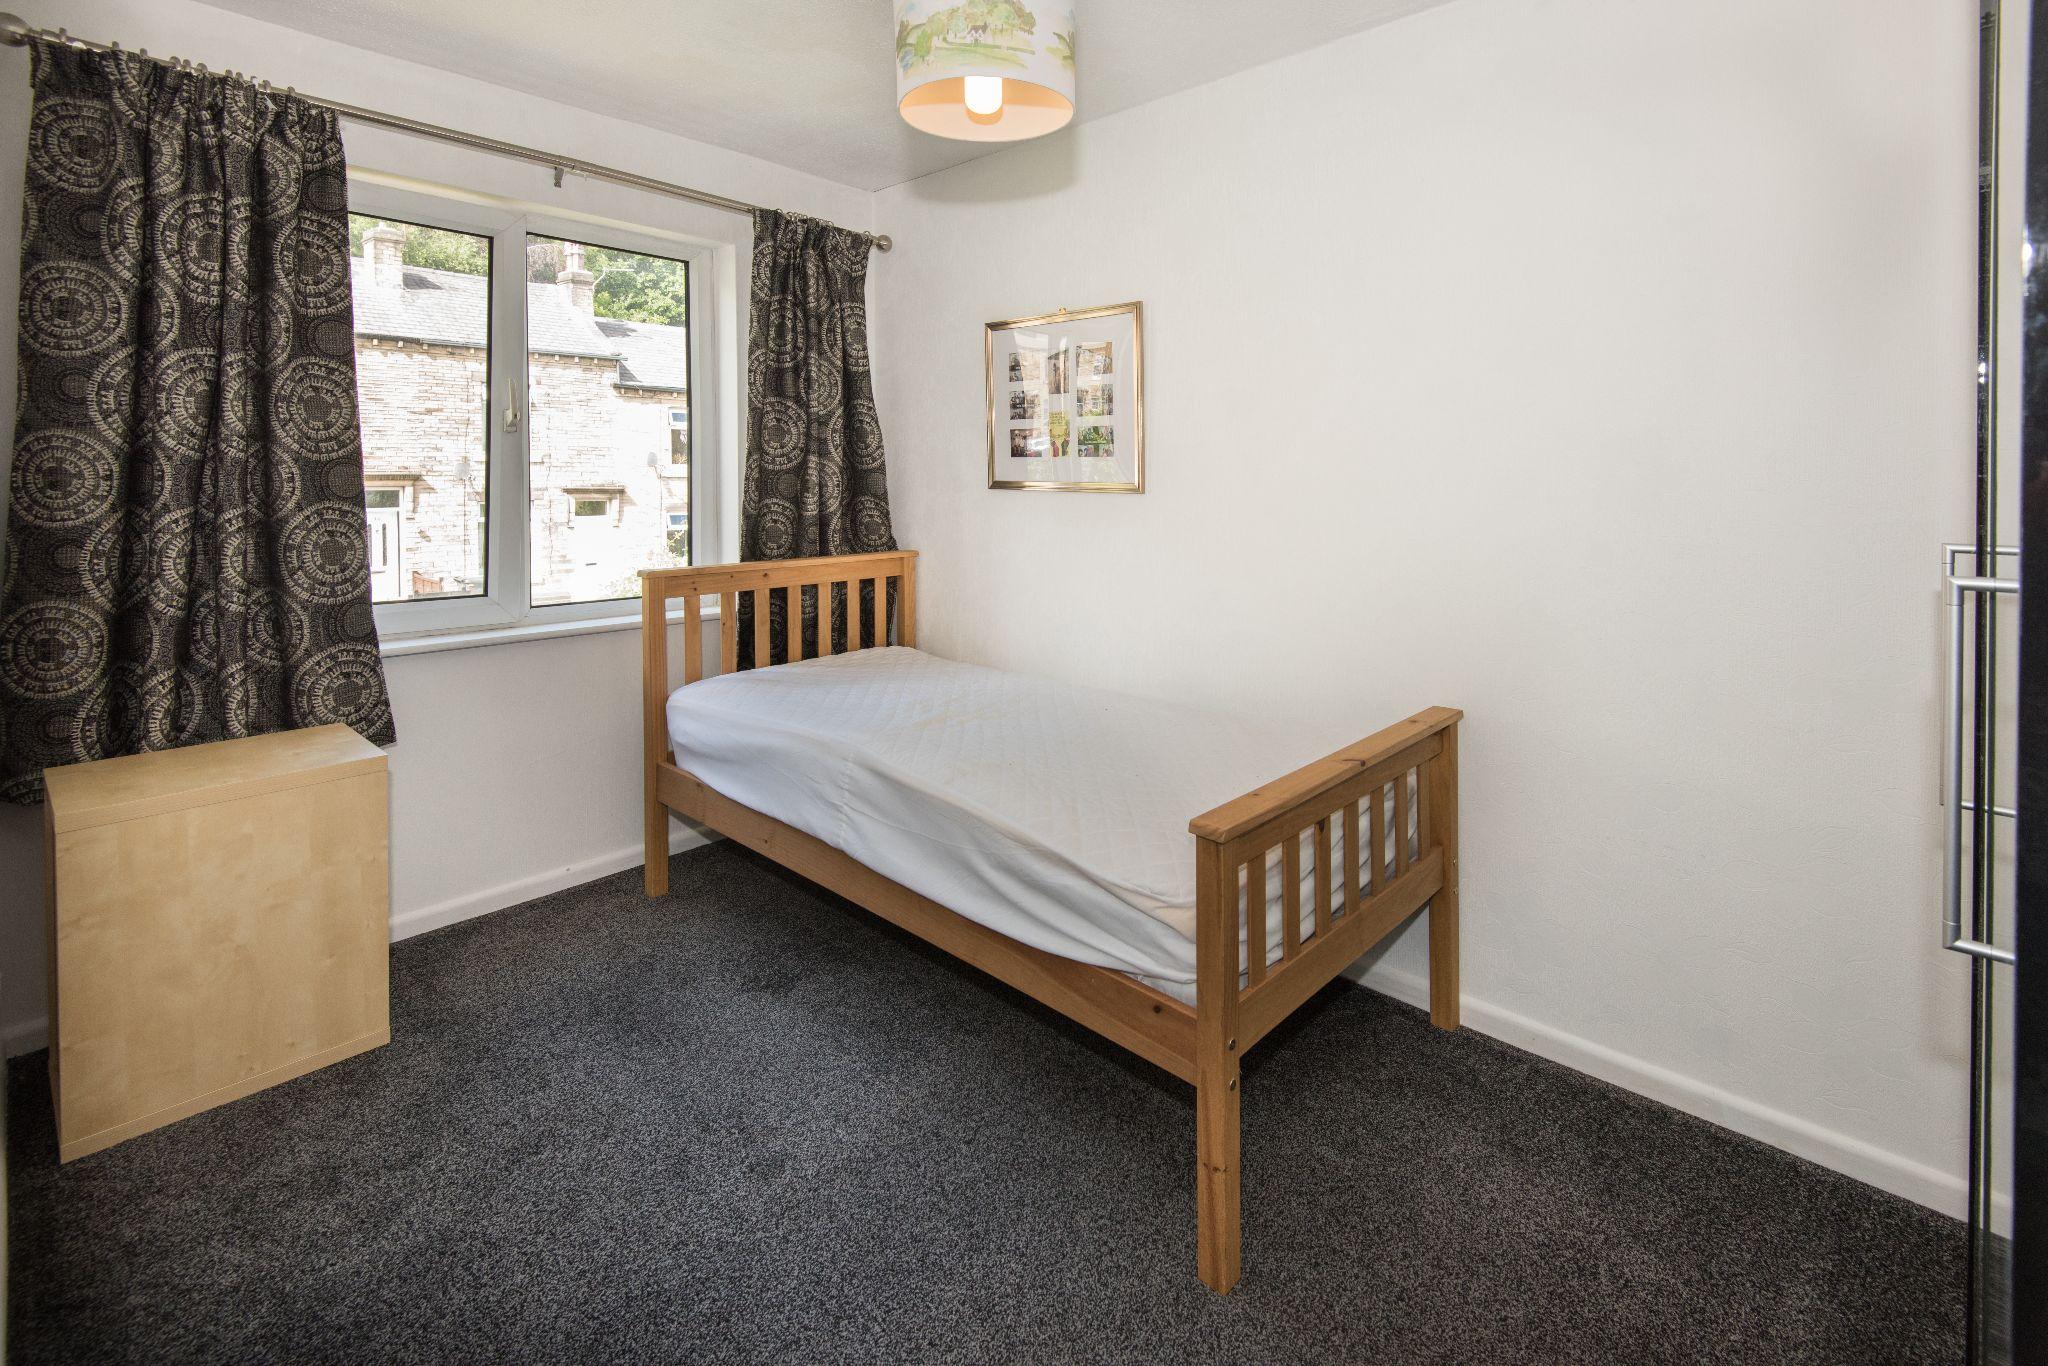 4 Bedroom Detached House For Sale - Bedroom